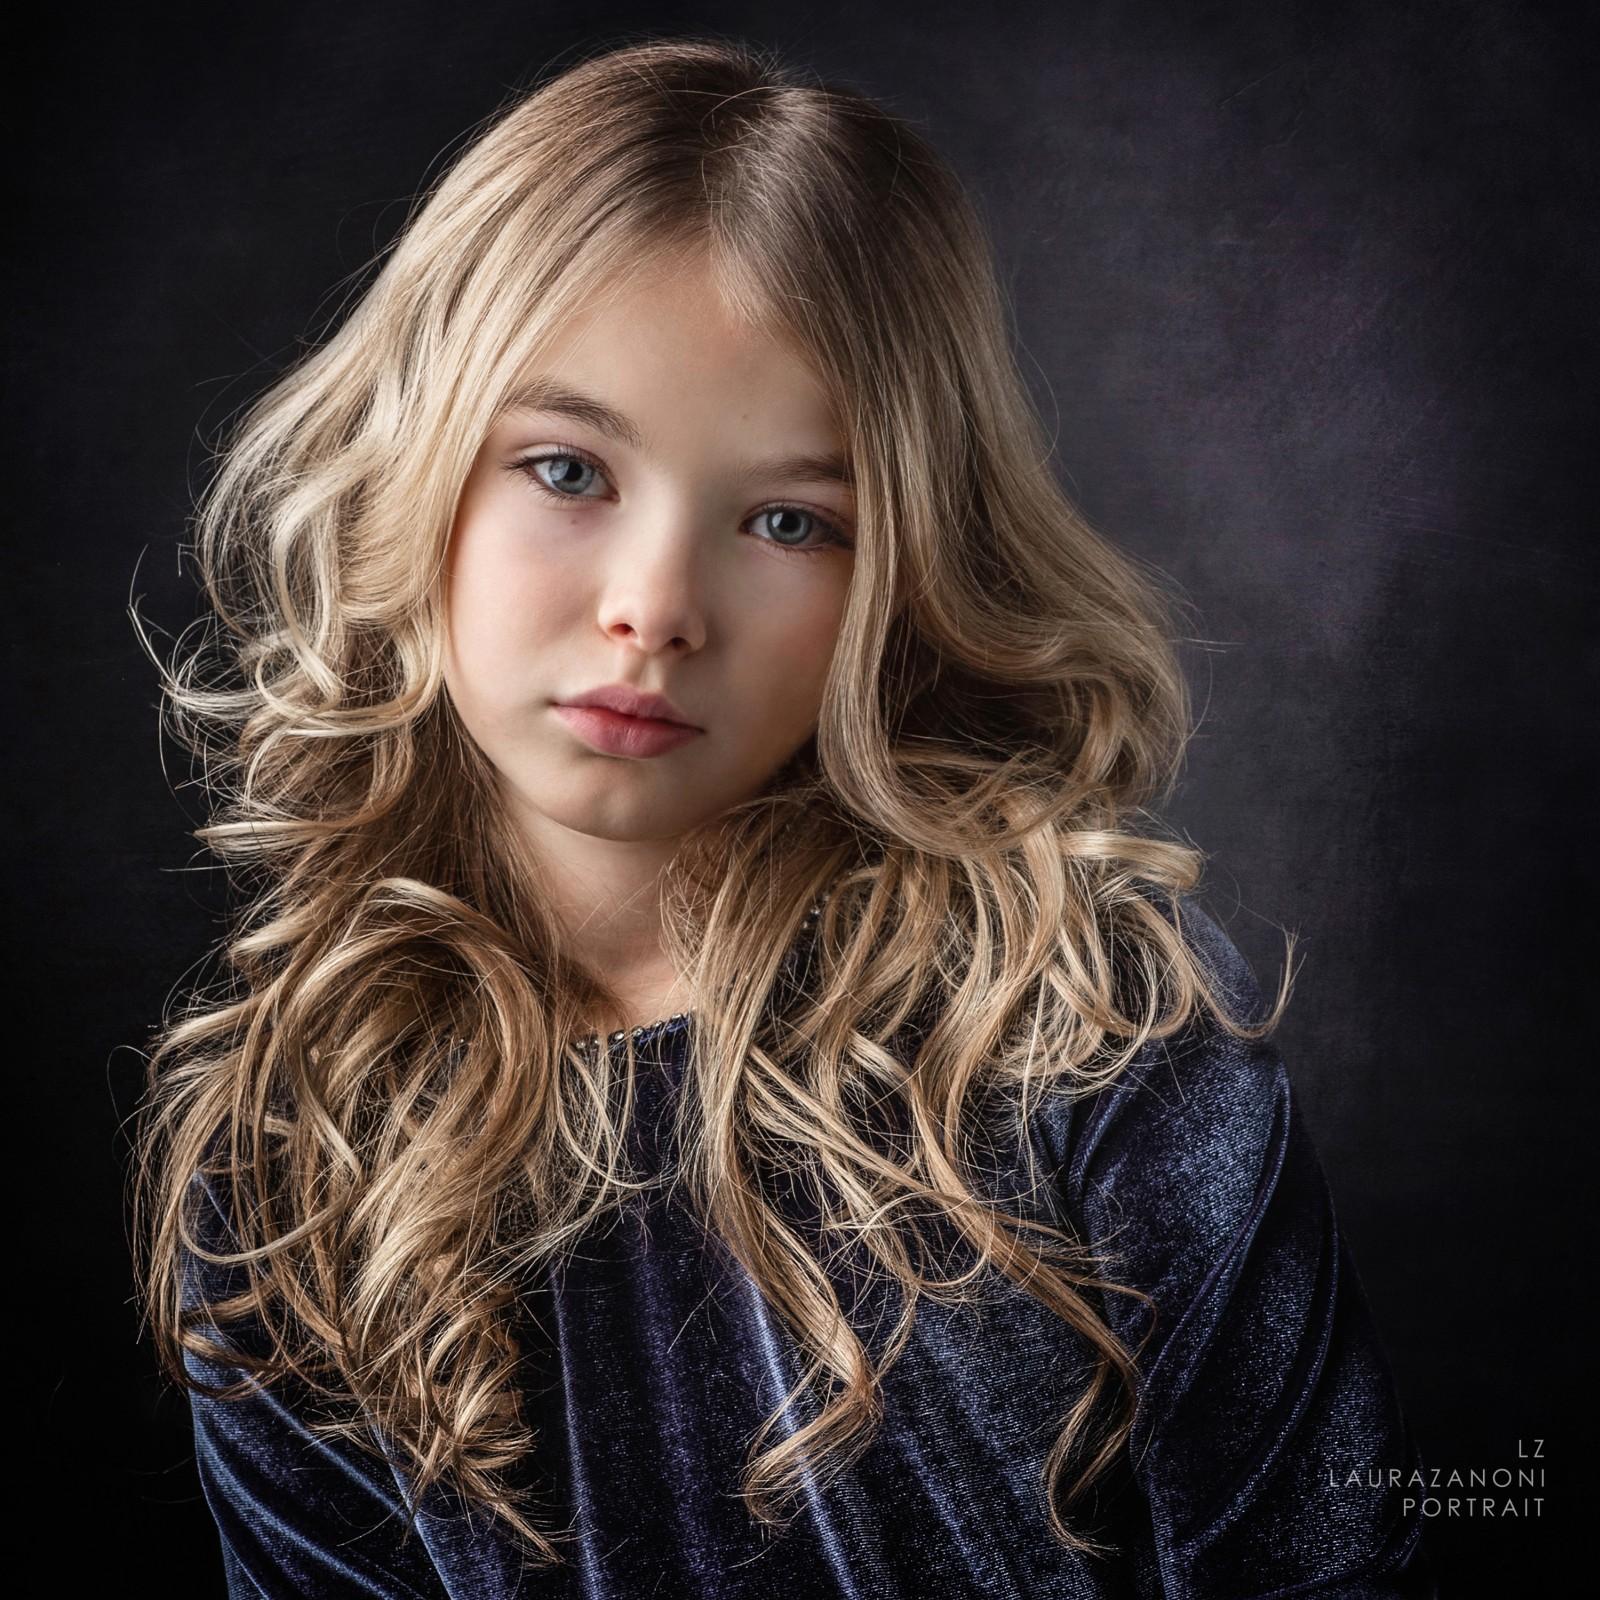 Art of Portrait: Lighting & Posing.